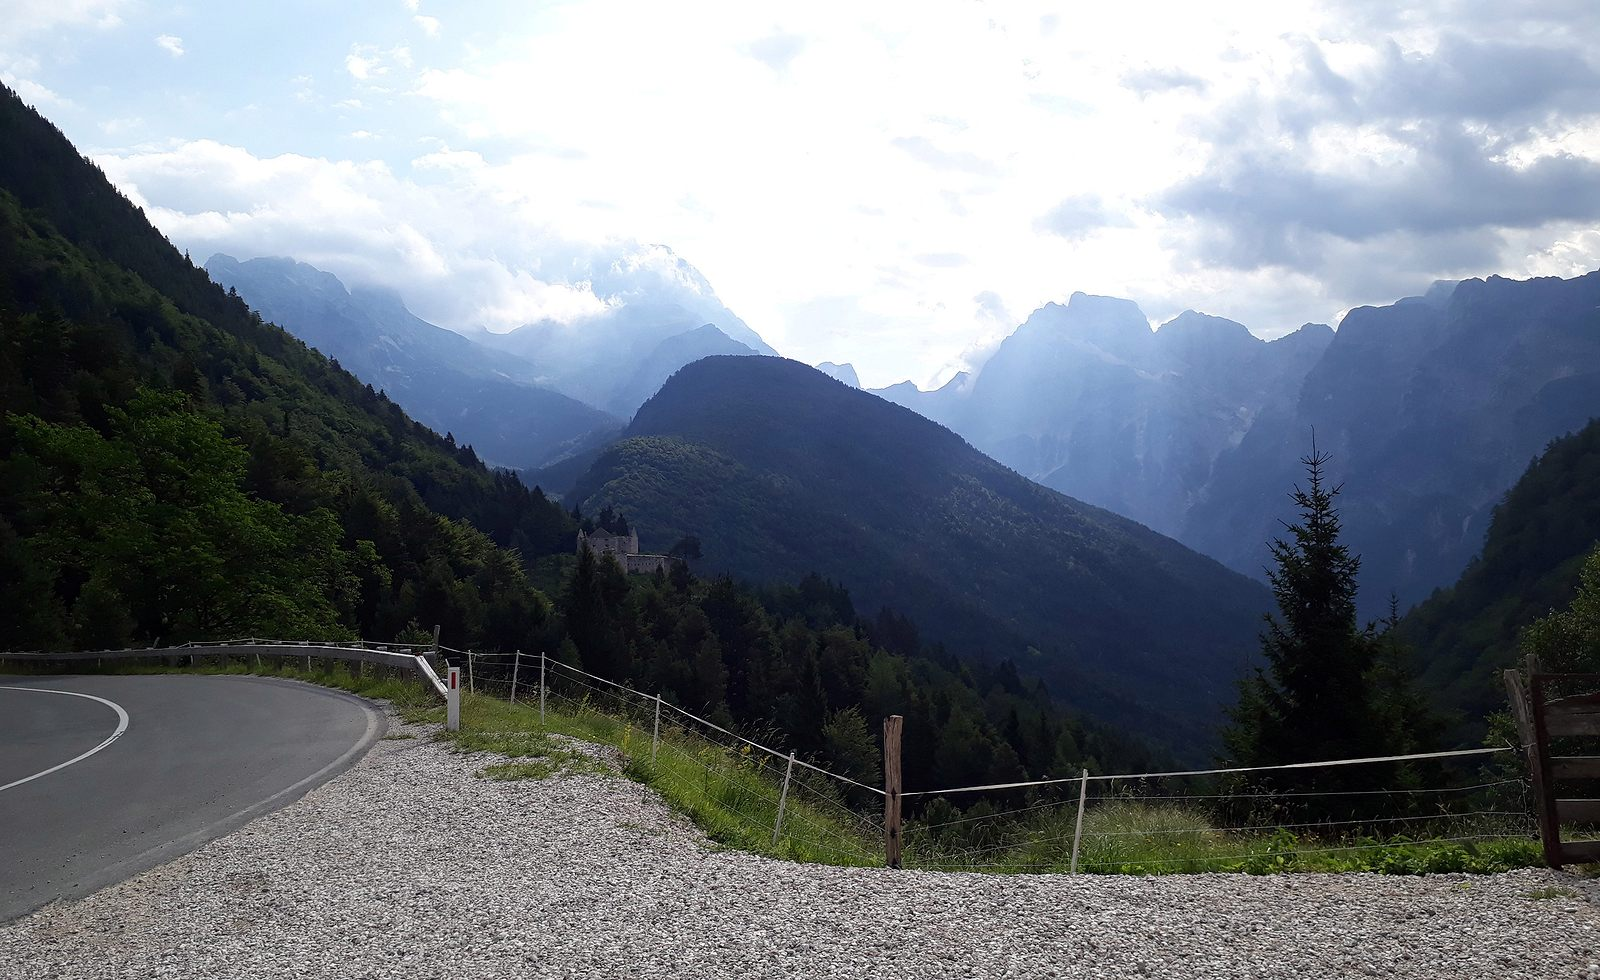 Z Talianska do Slovinska cez Passo del Predil, straá pevnosť je už na slovinskej strane